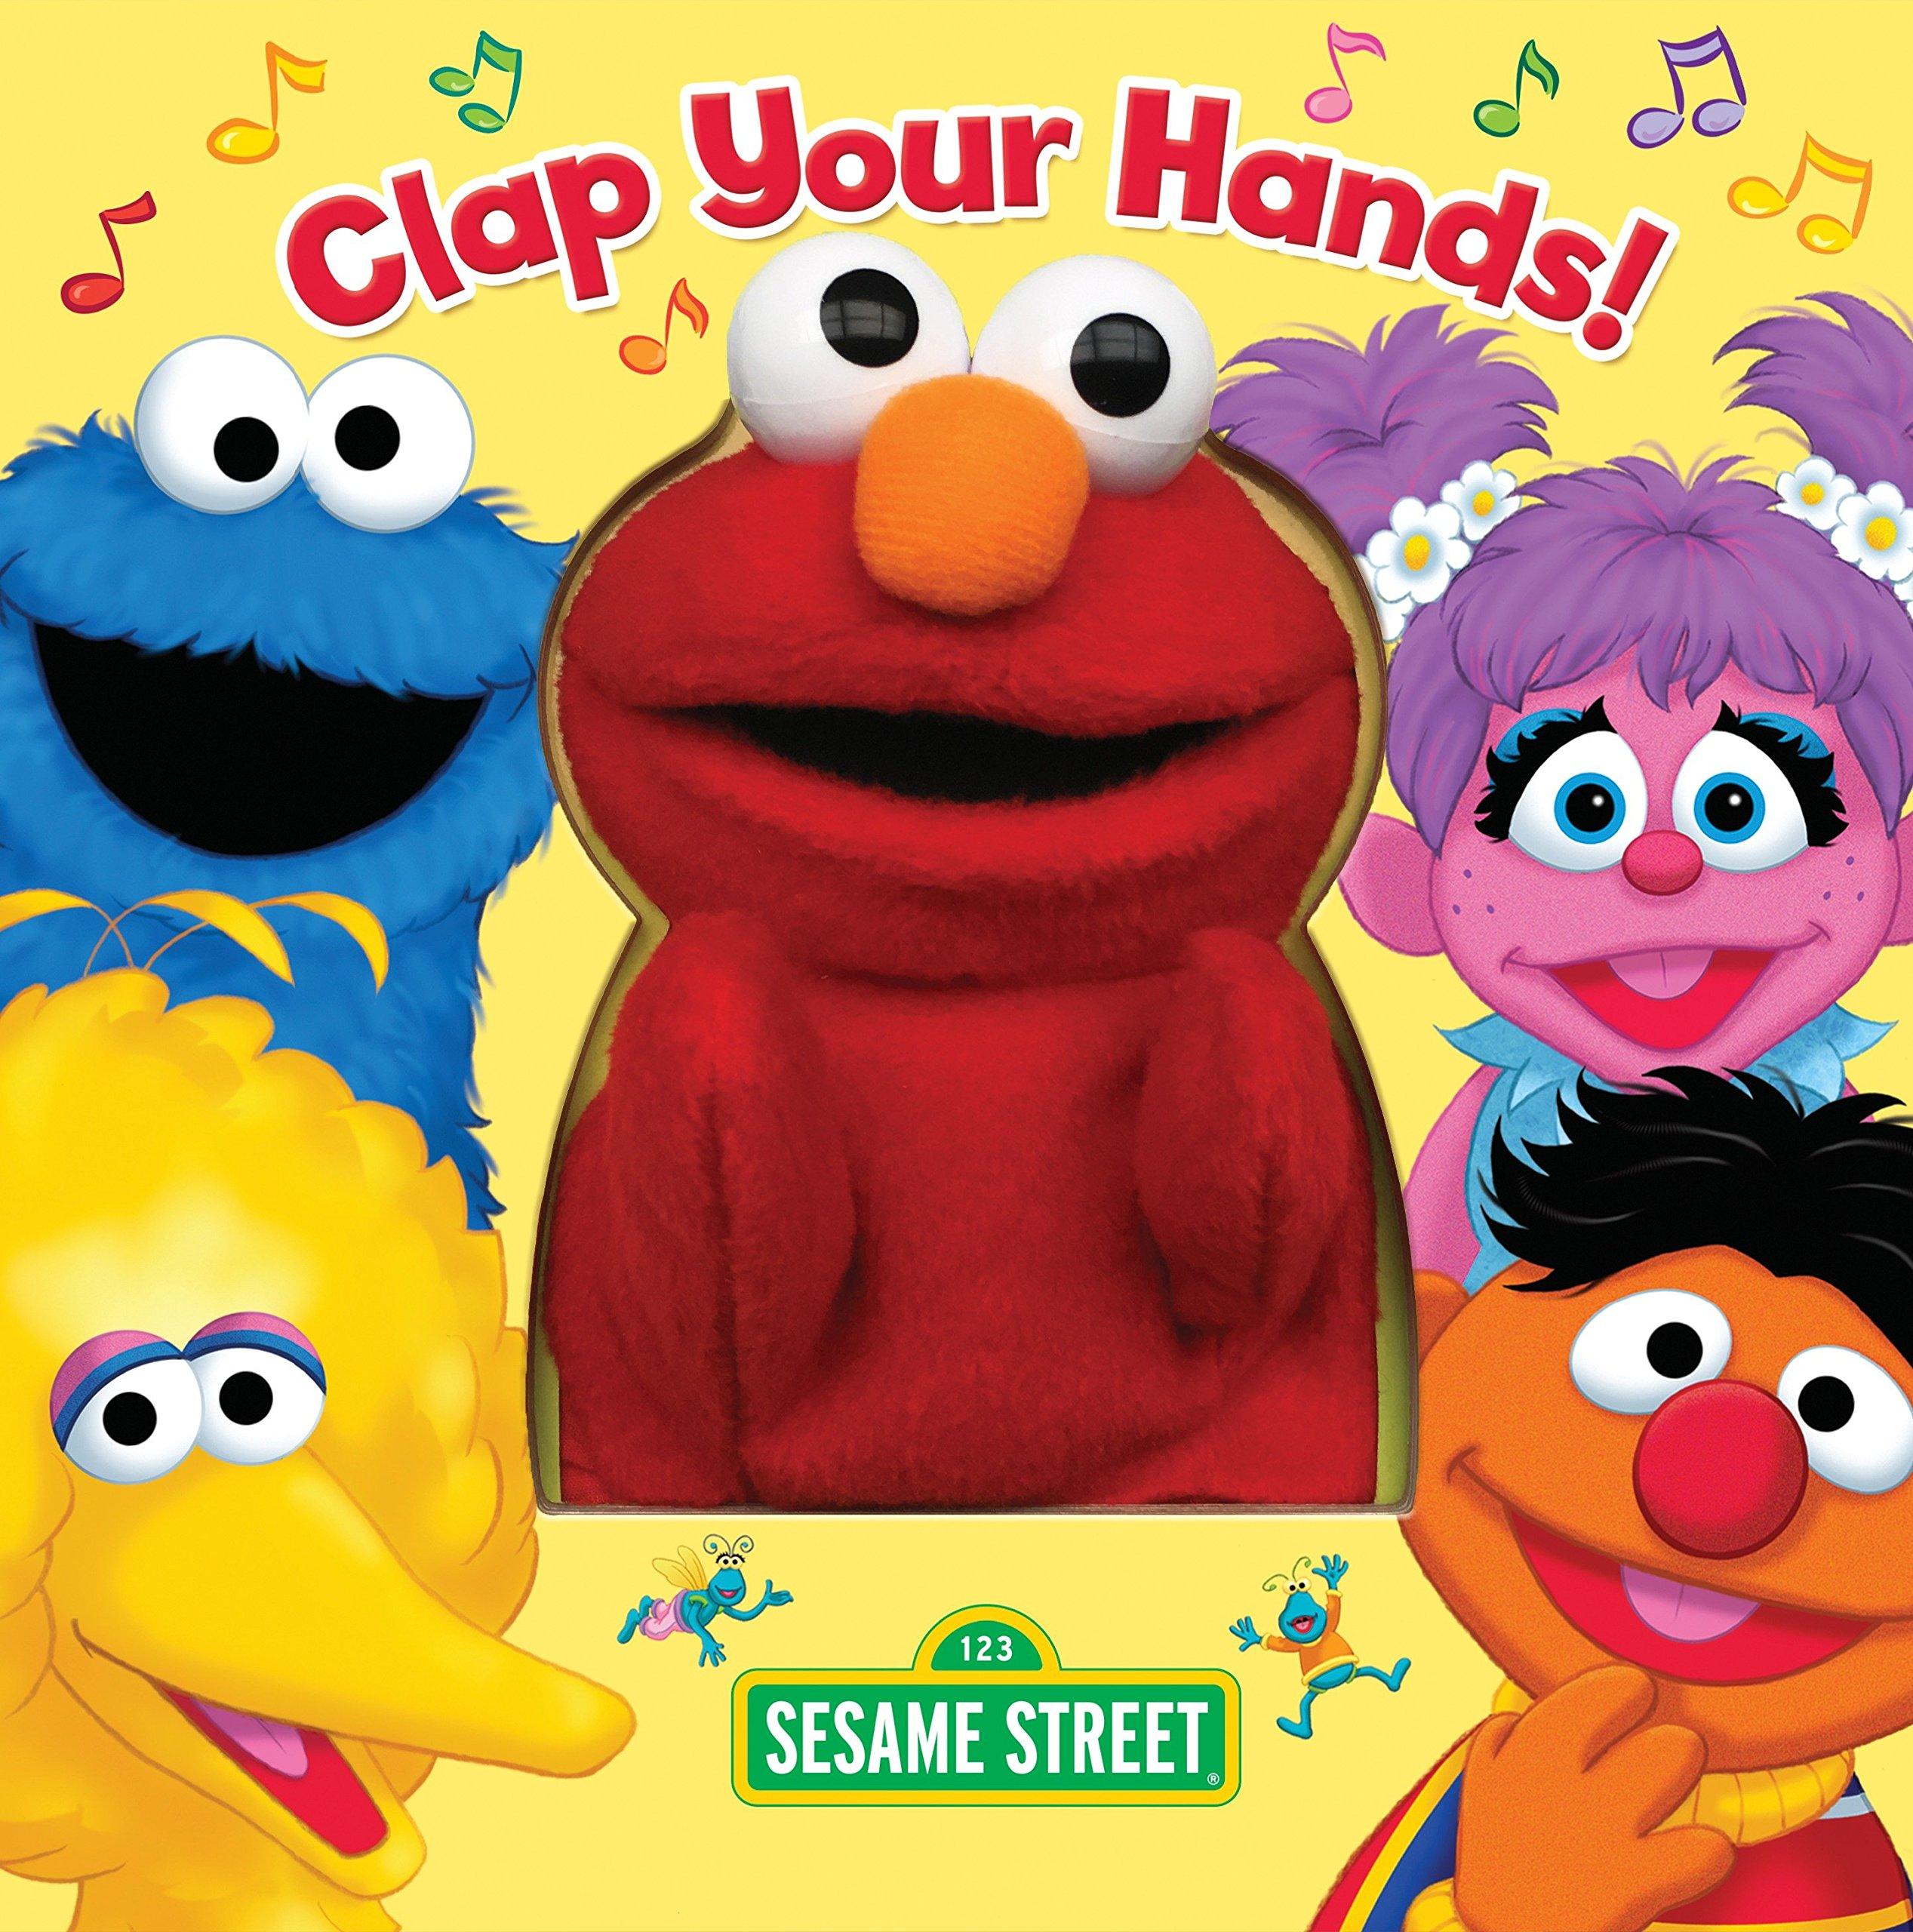 Elmo clipart happy new year. Amazon com clap your